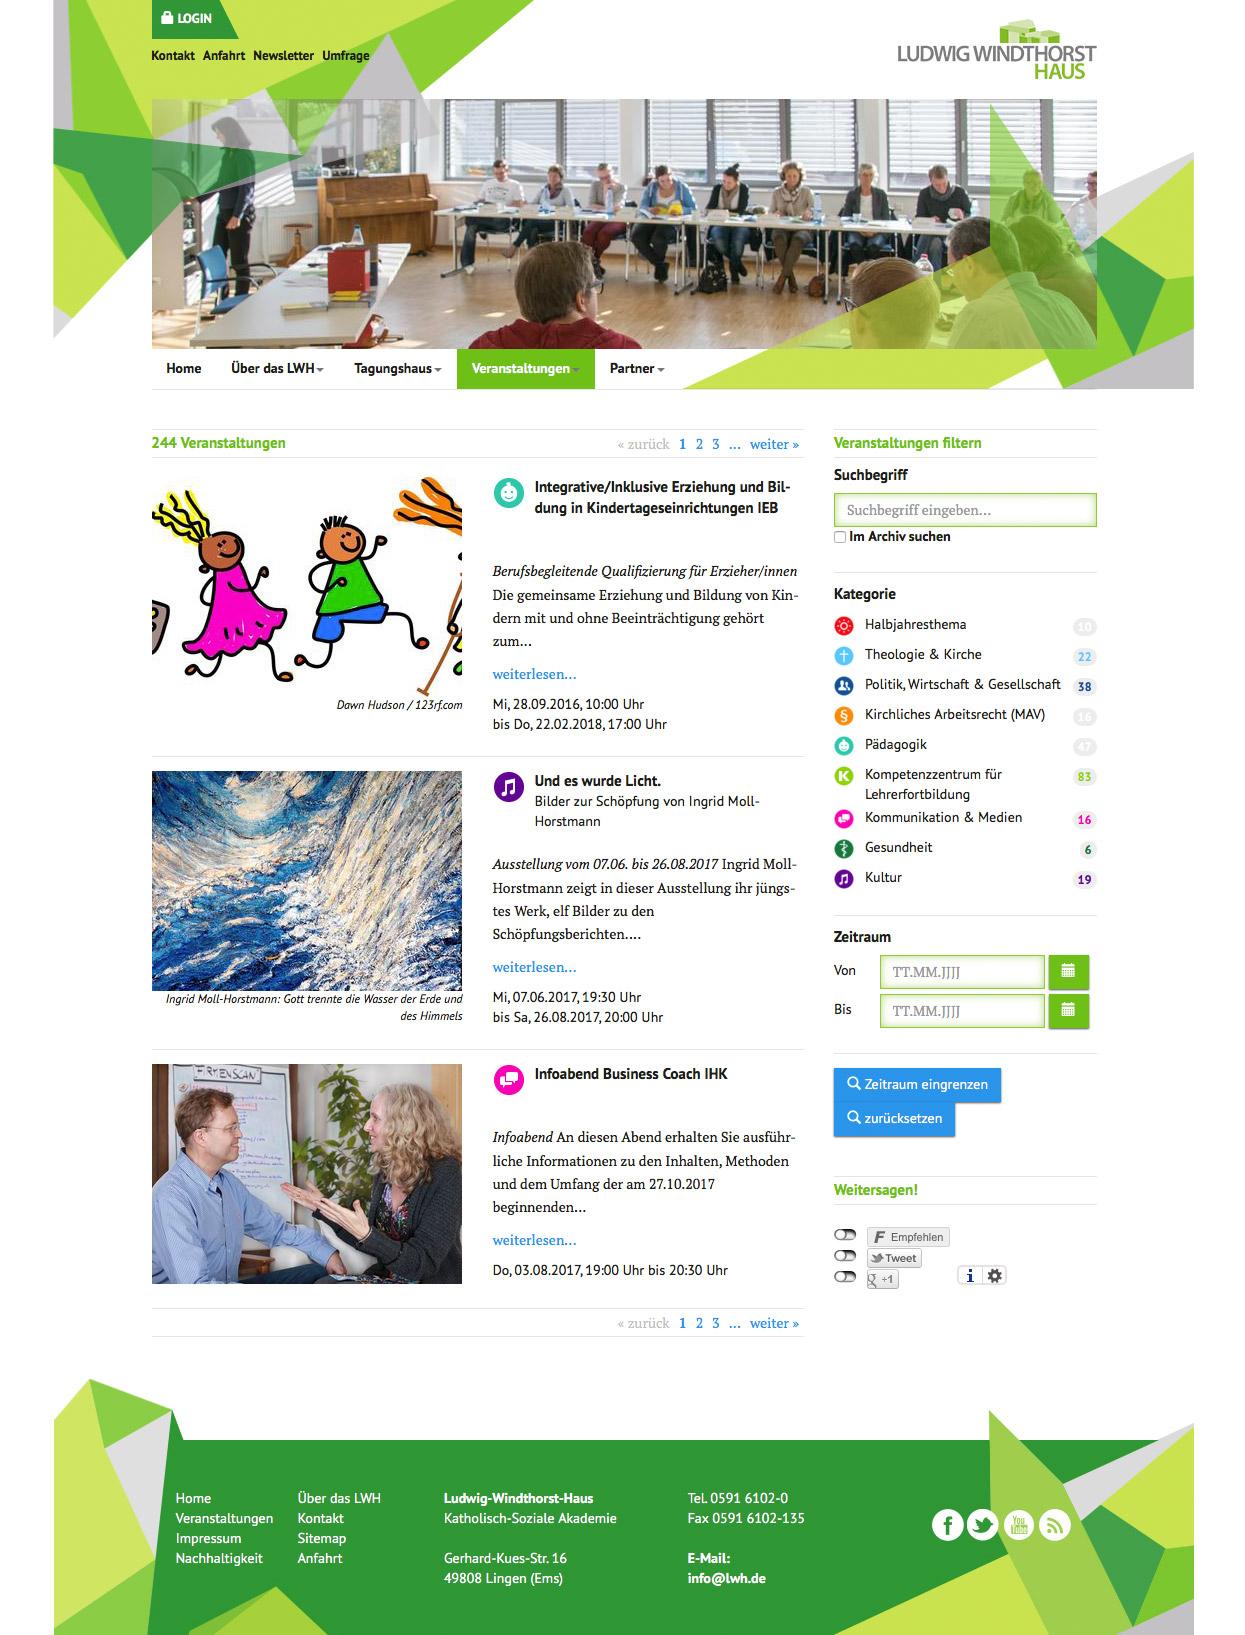 LWH Ludwig Windthorst Haus Webseite Seminare Veranstaltungsmodul